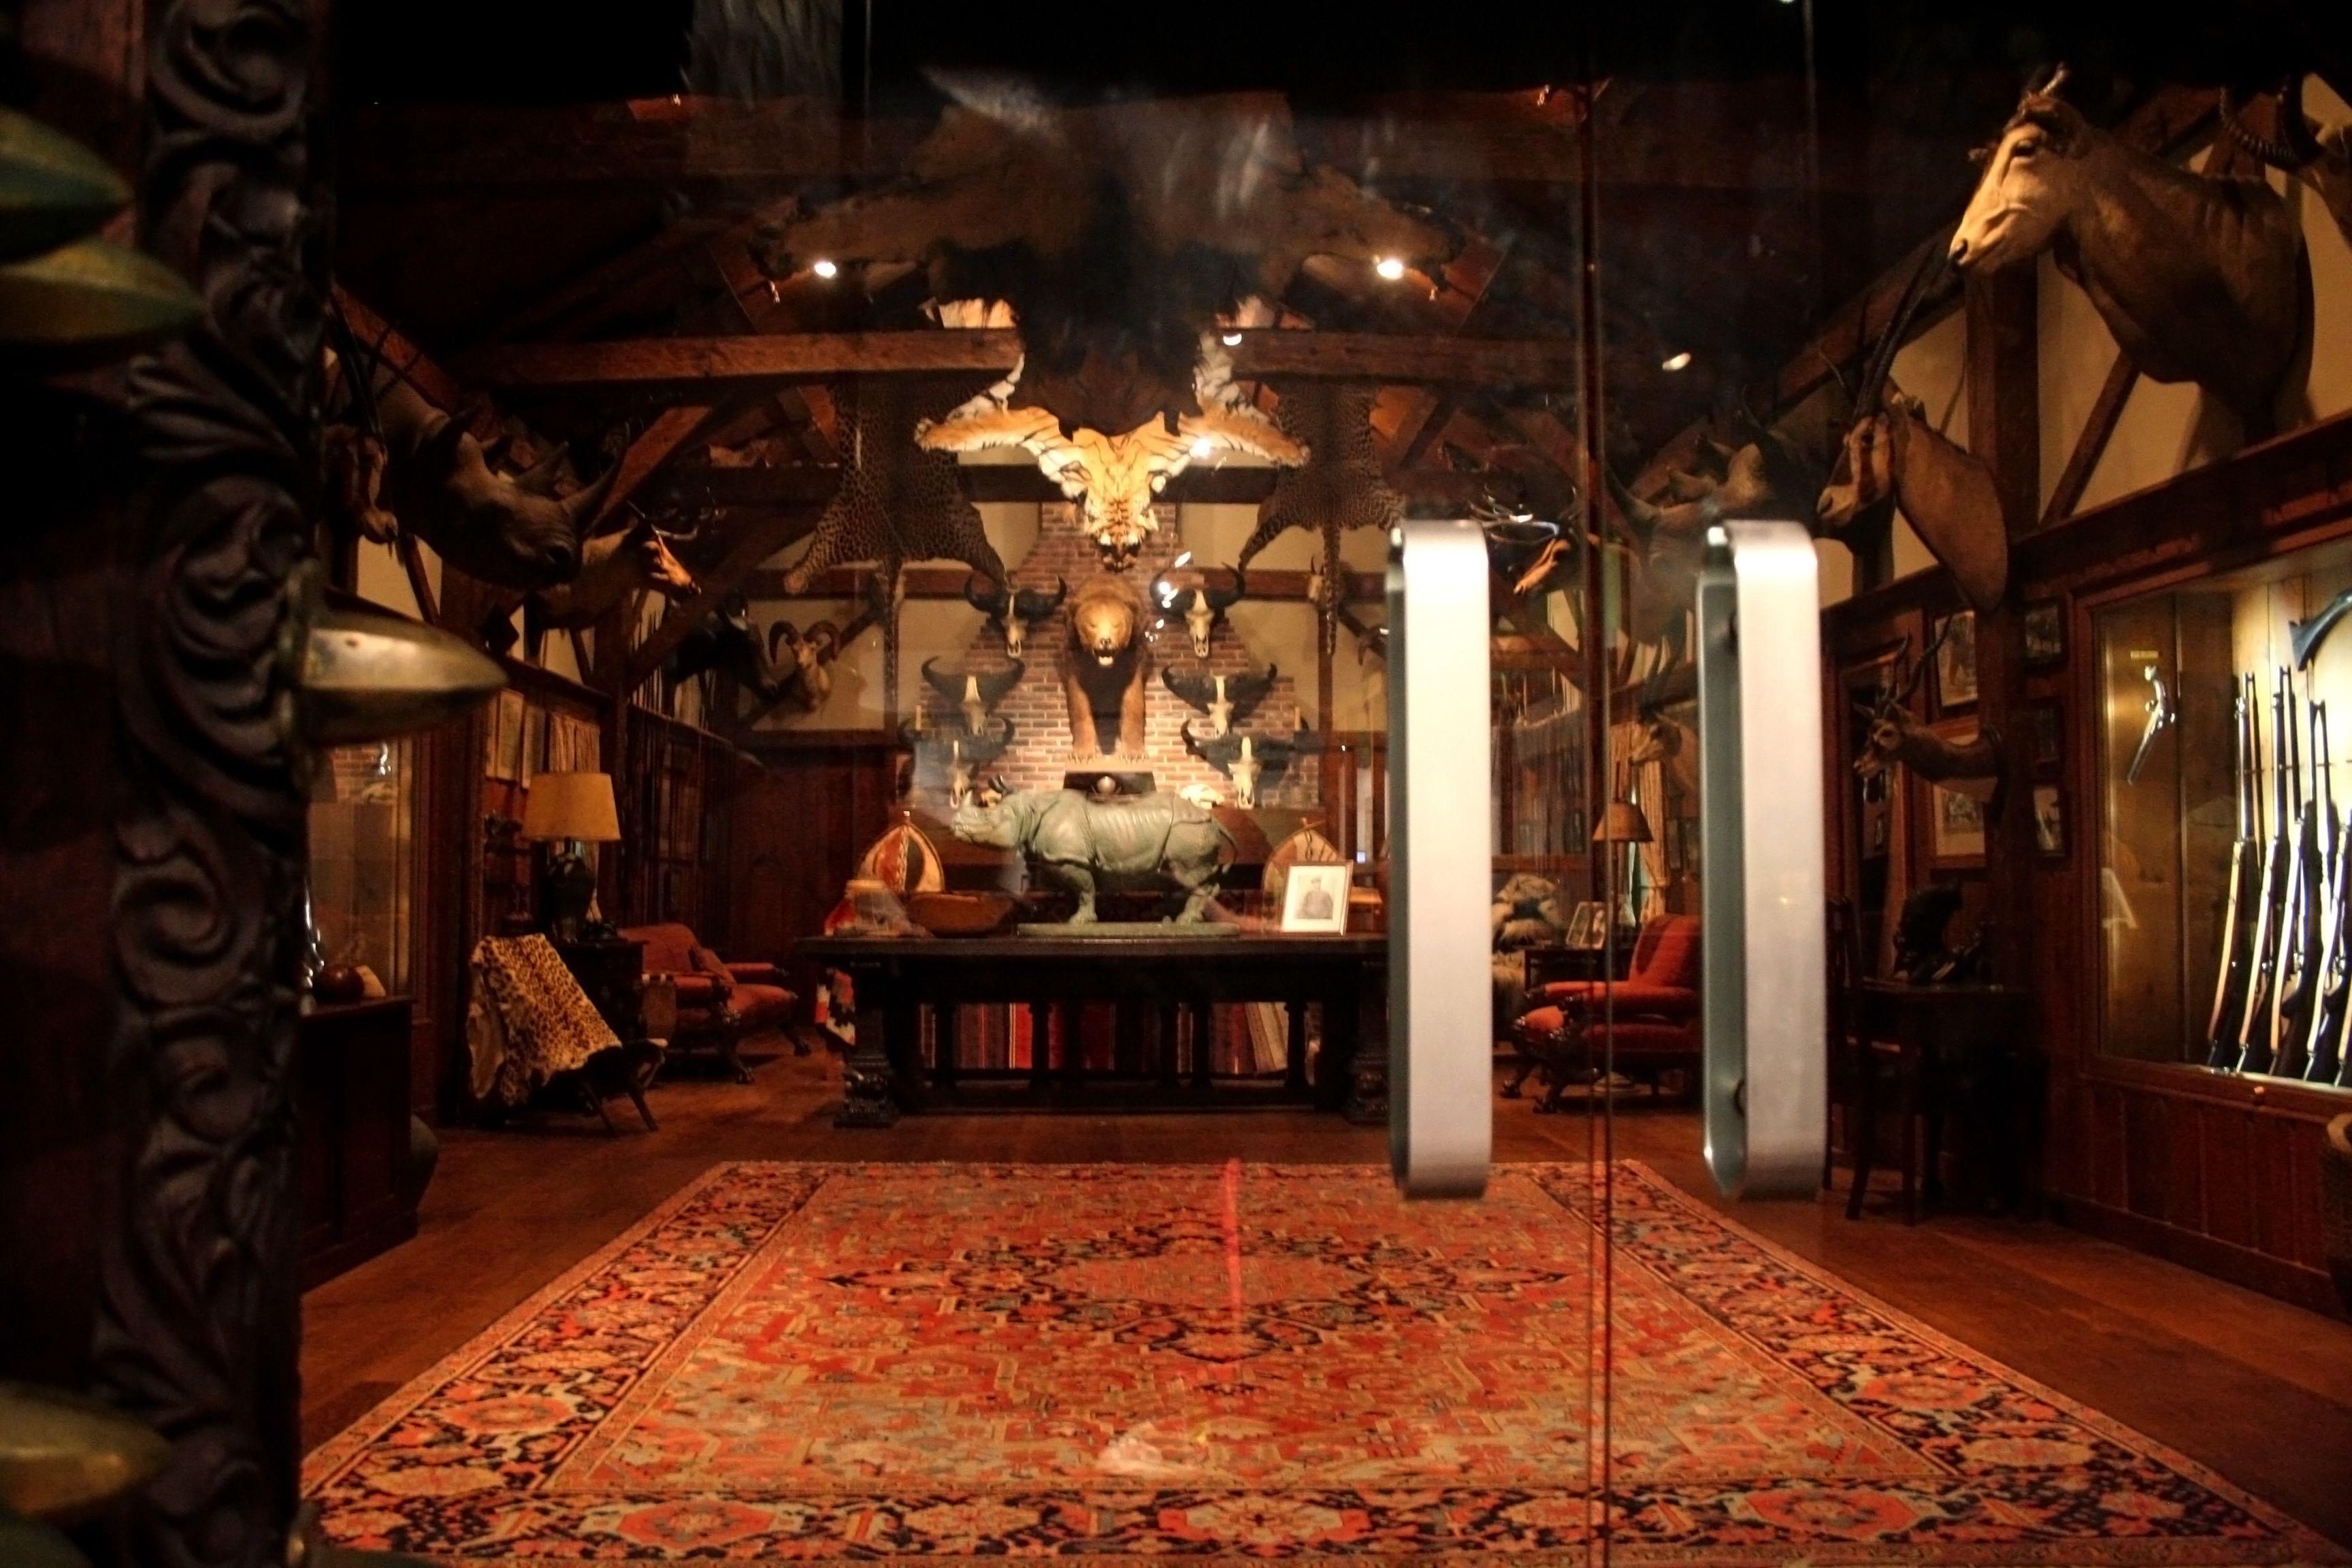 Colby-Room-Large.jpg (3456×2304) | Trophy Room Museum of Science ...